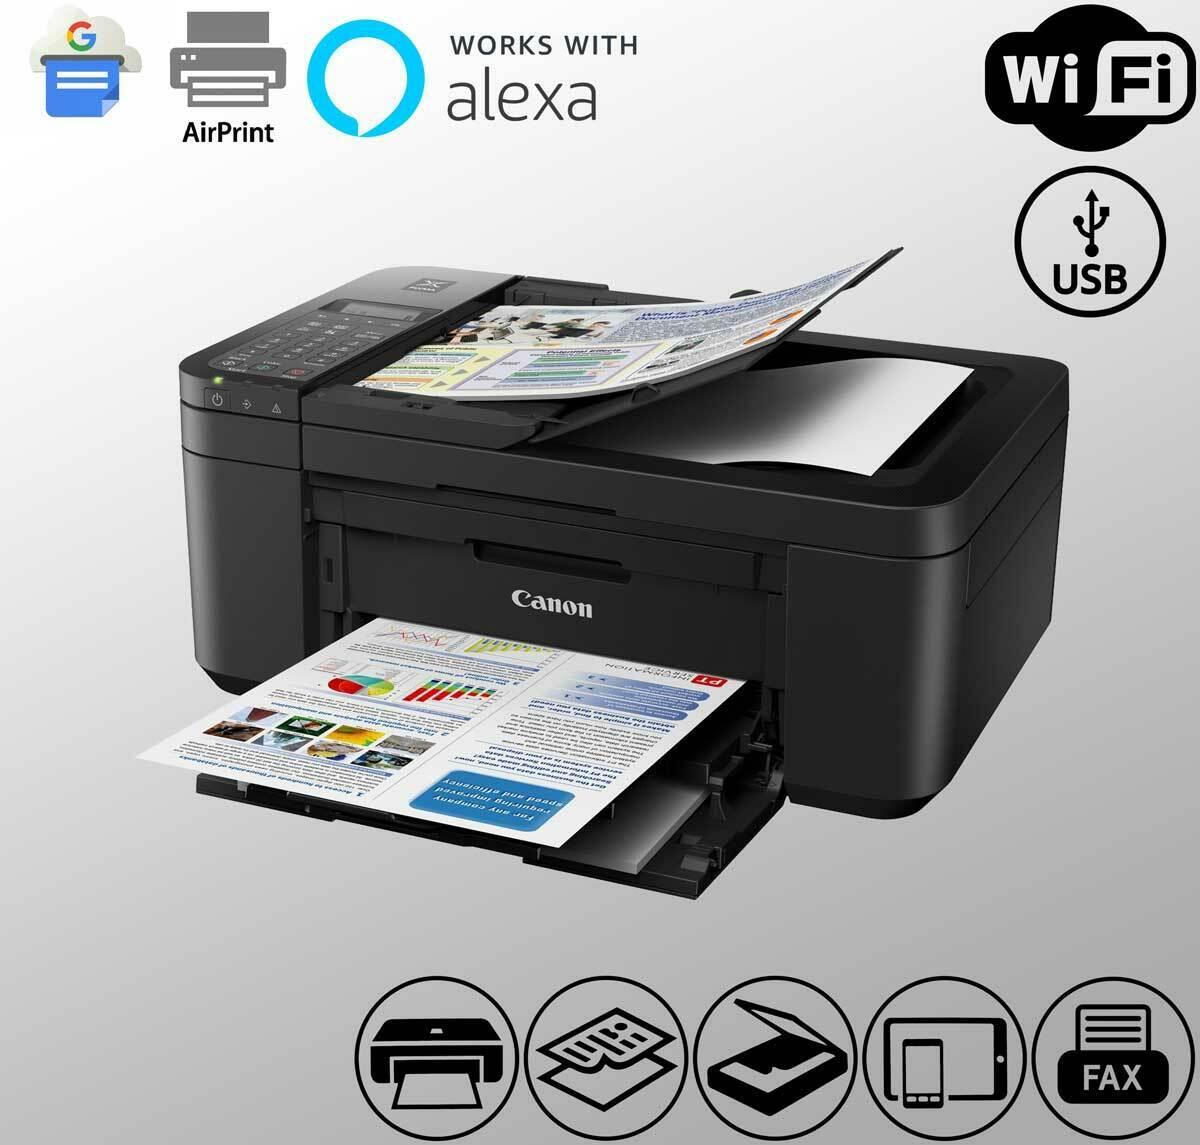 Wireless Canon Fax Printer Scanner WiFi Alexa Duplex Siri Mo